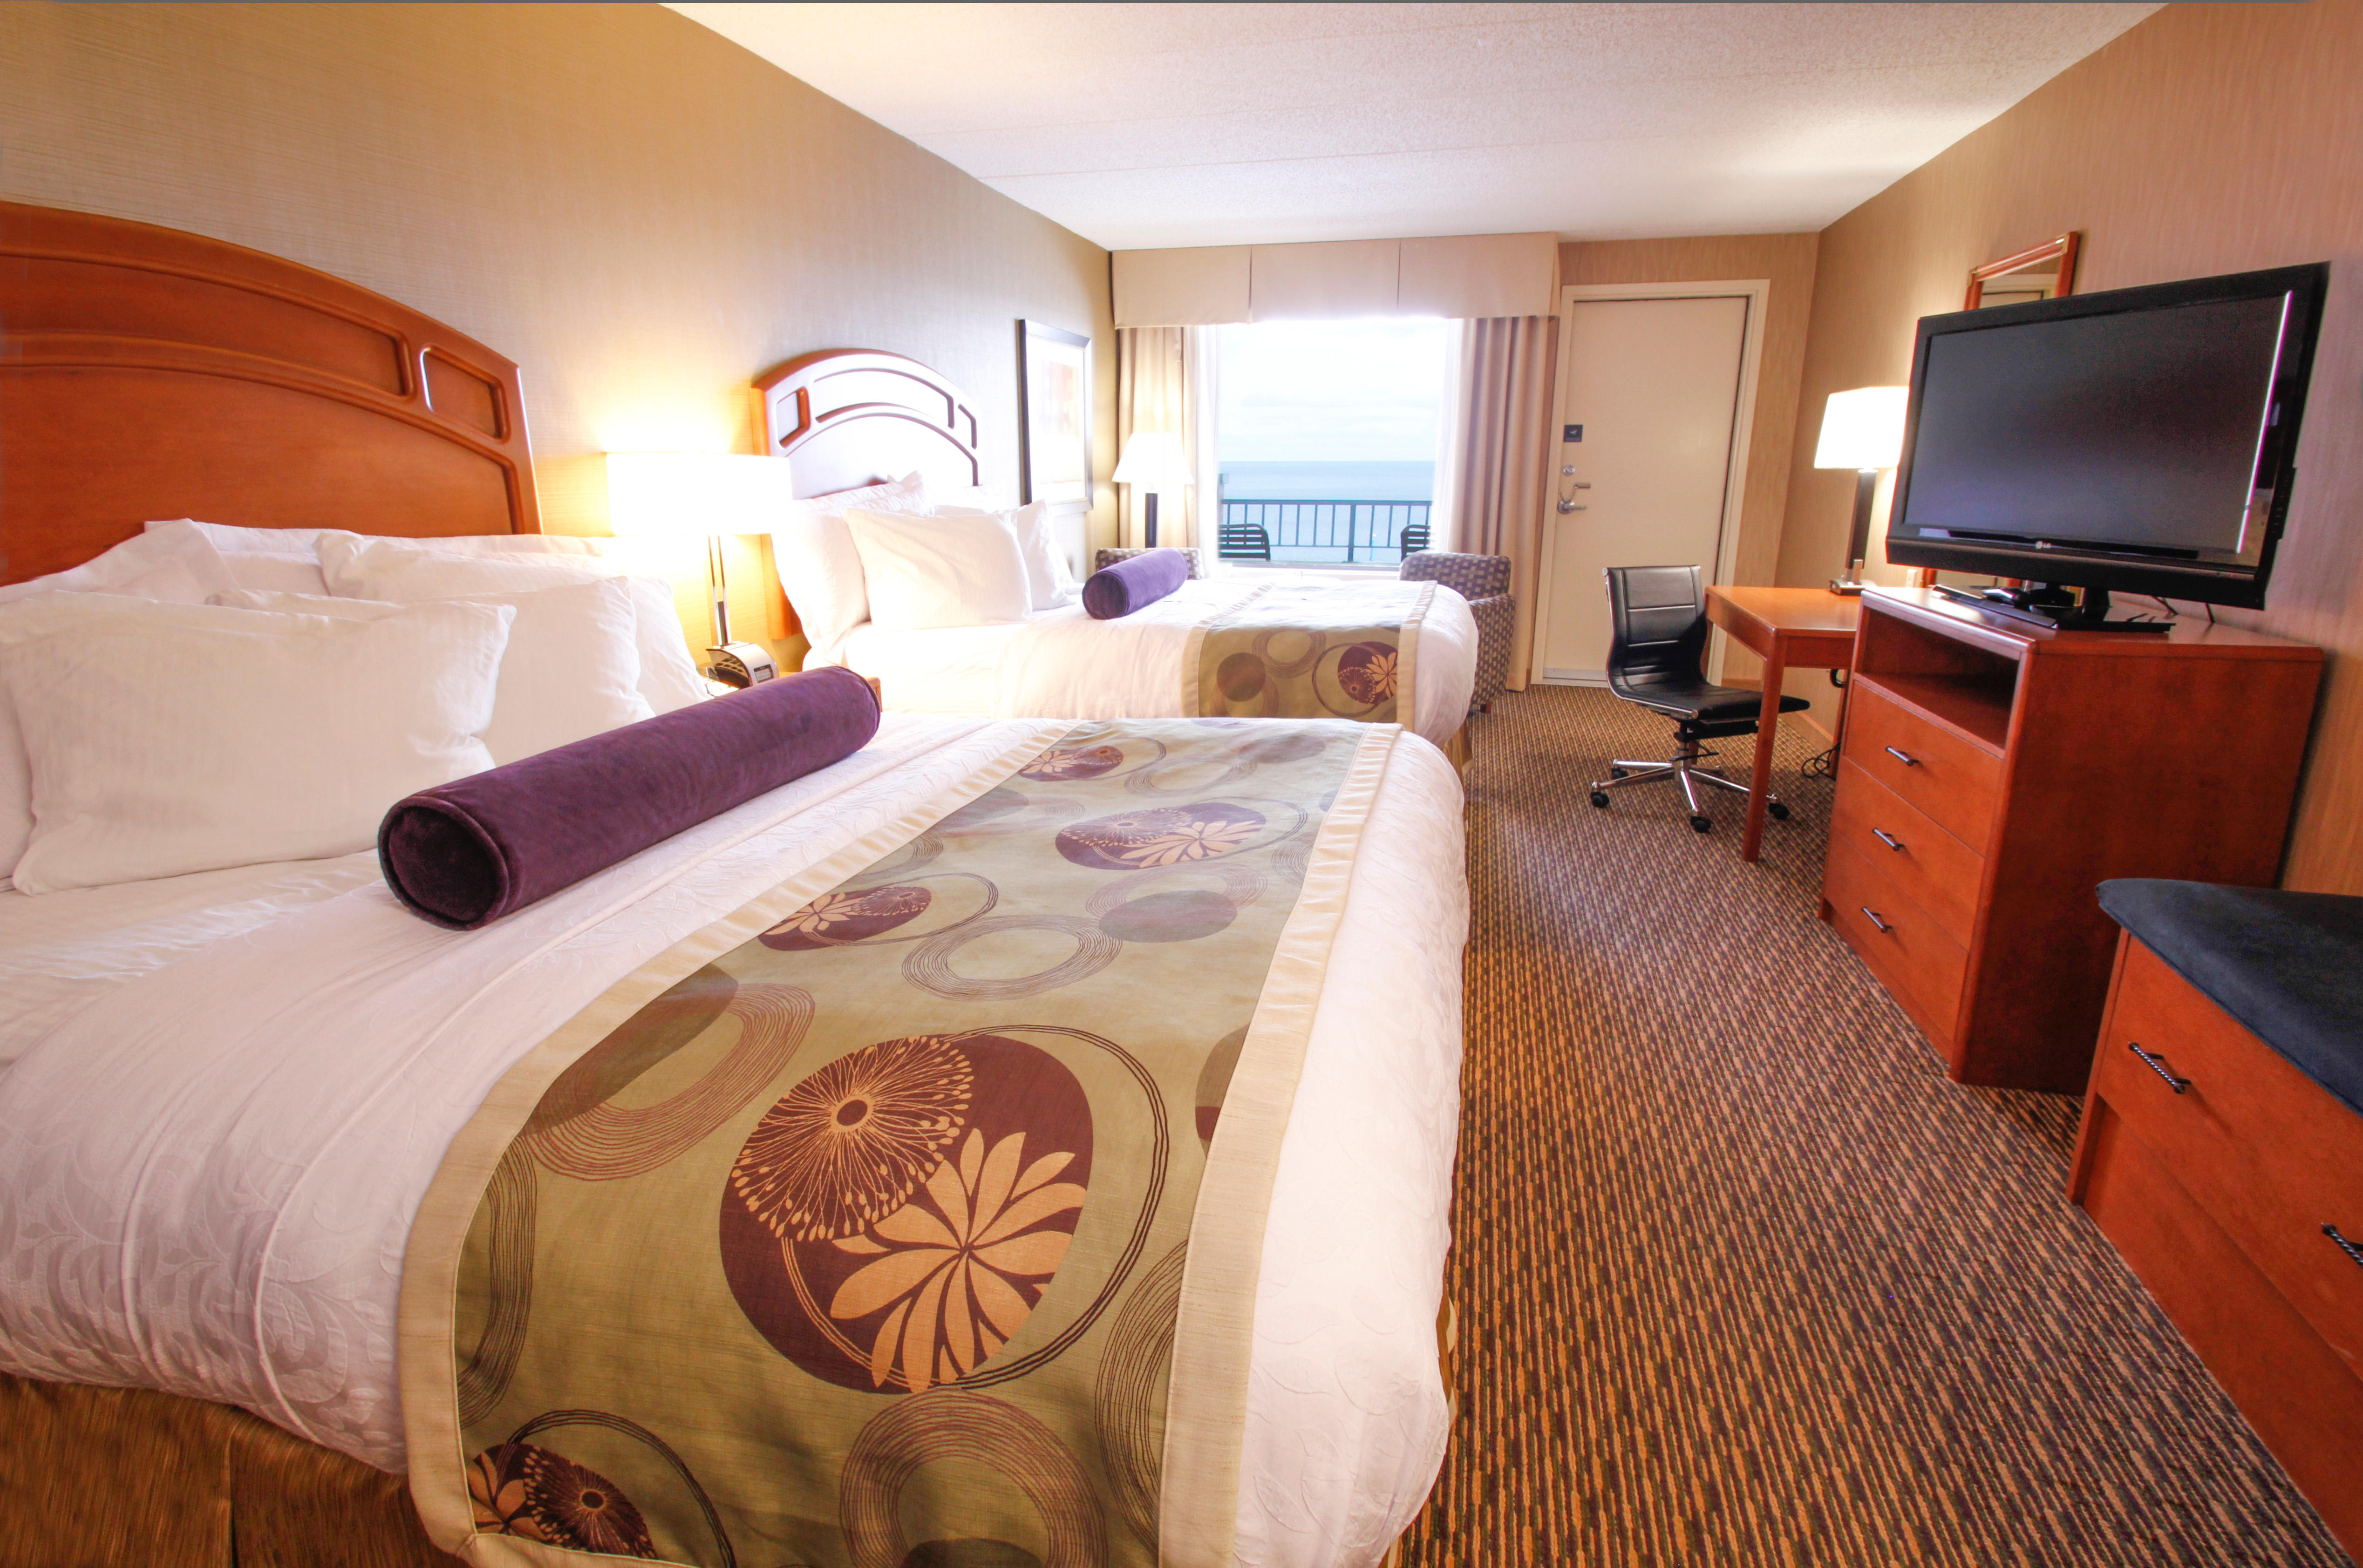 The Inn on Lake Superior image 4